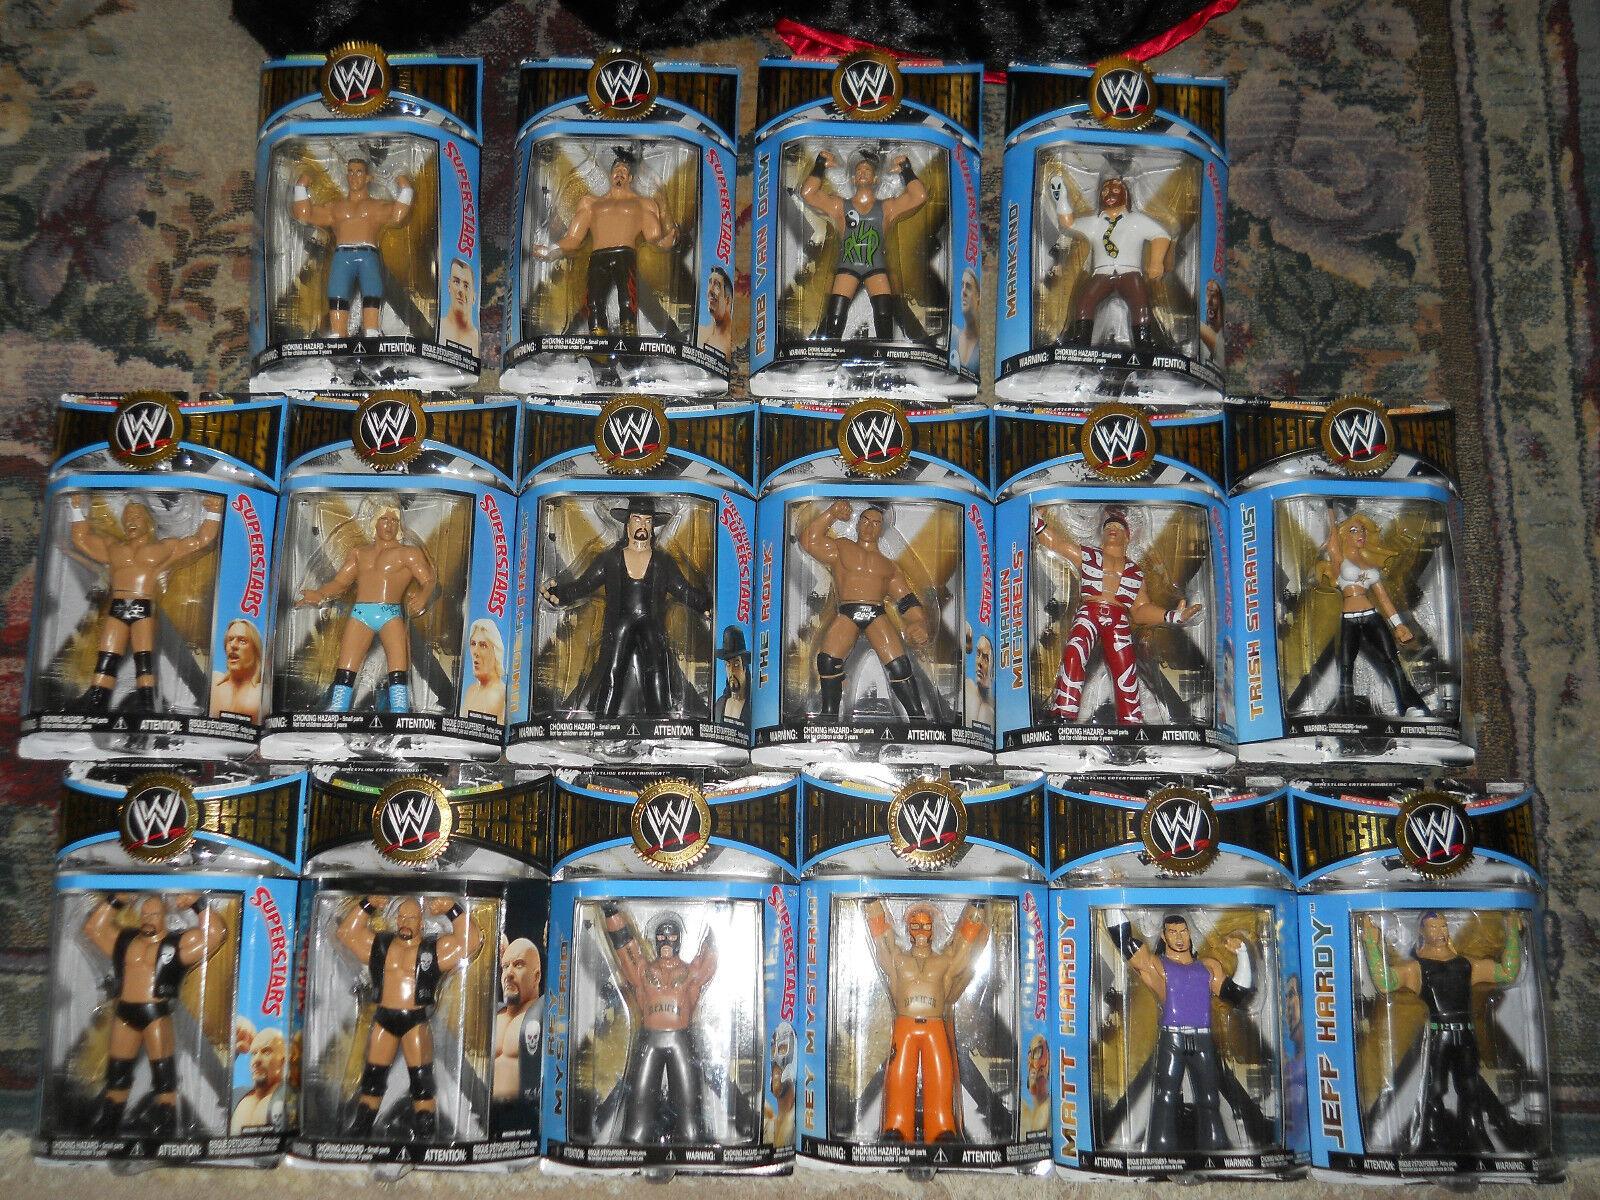 Jakks WWF WWE classeIC WRESTLING SUPERestrellaS ljn CHASE cifra,moc cifra,moc cifra,moc LOT b9b1bf